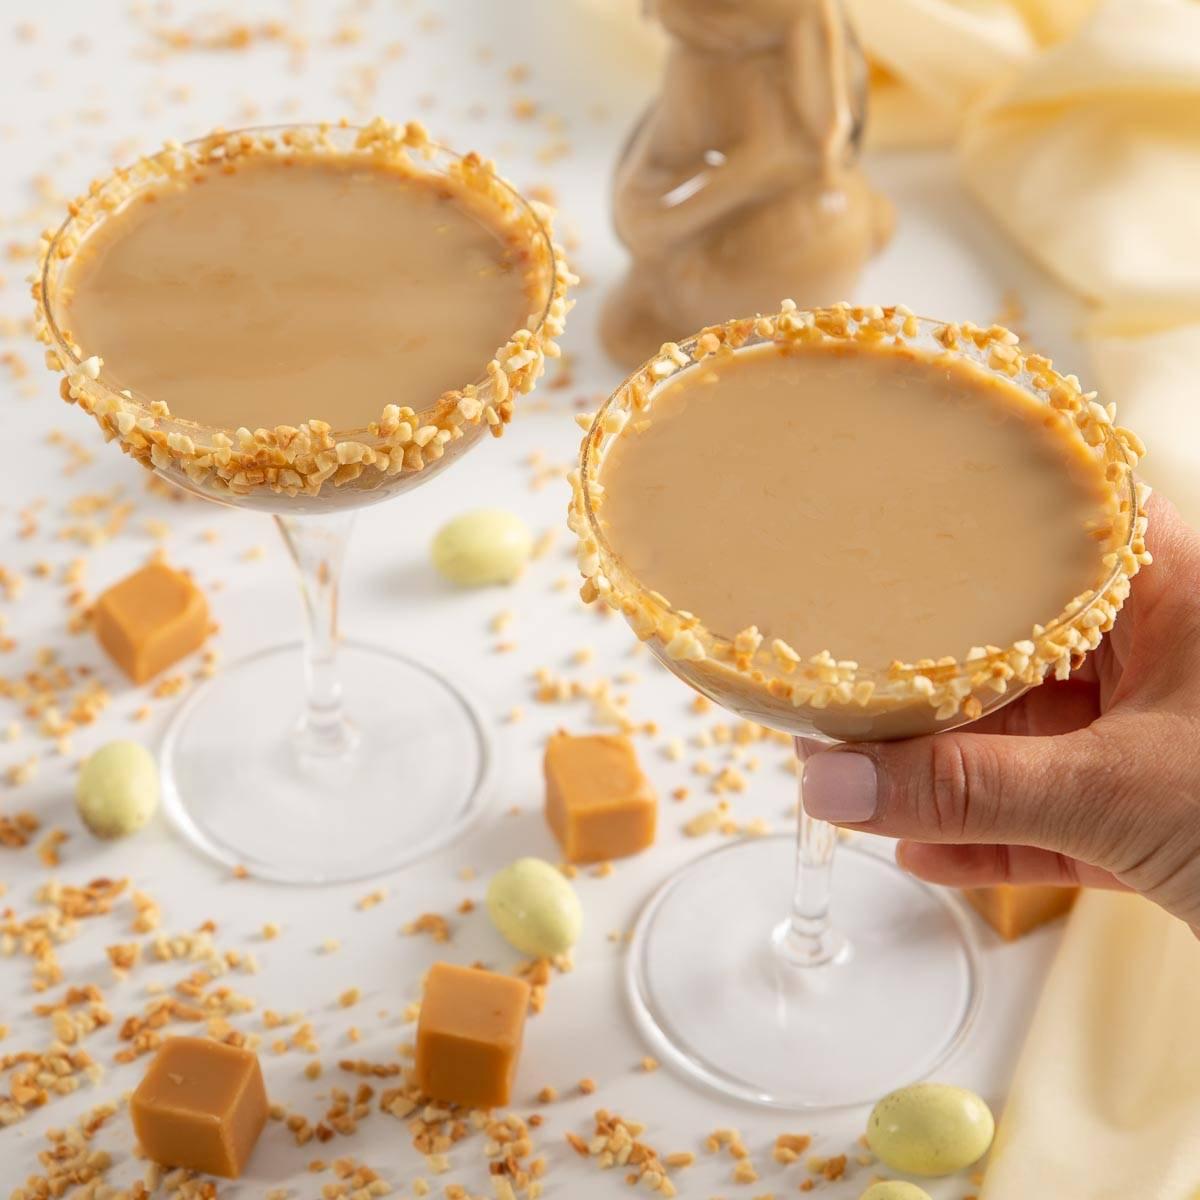 Salted Caramel Peanut Butter Martini Recipe